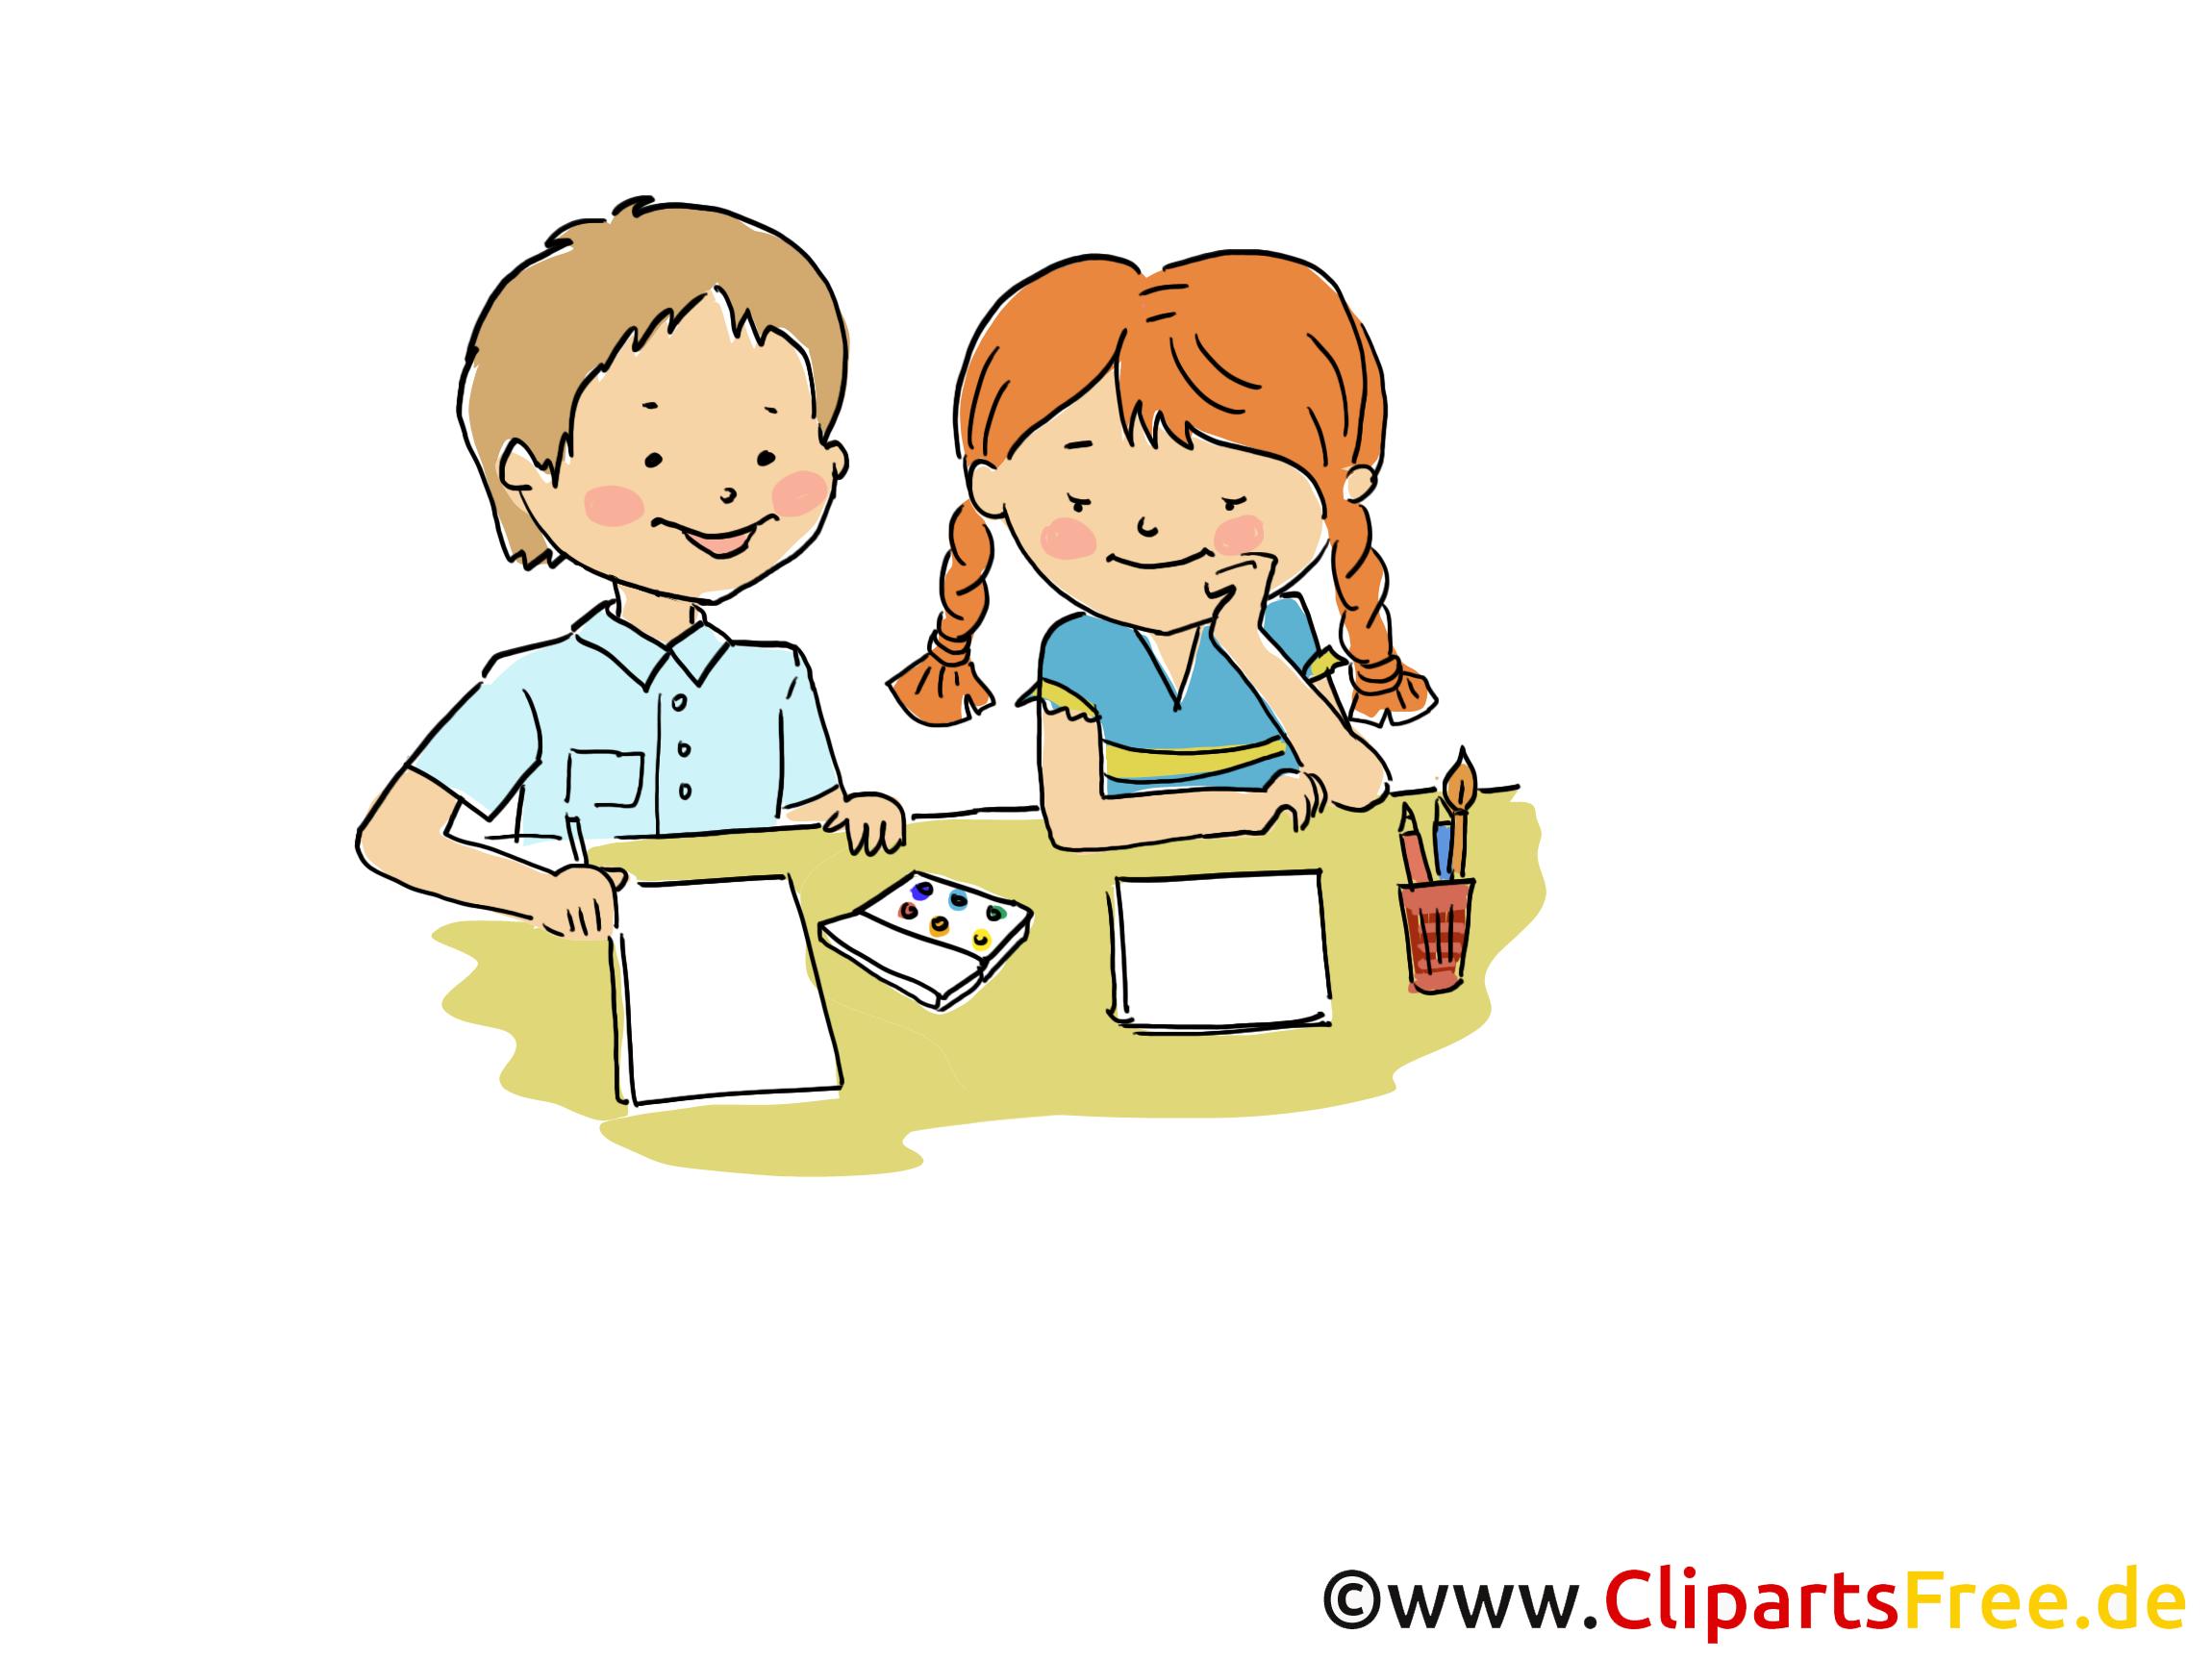 Krippe Bild Clipart Cartoon Grafik Comic Gratis